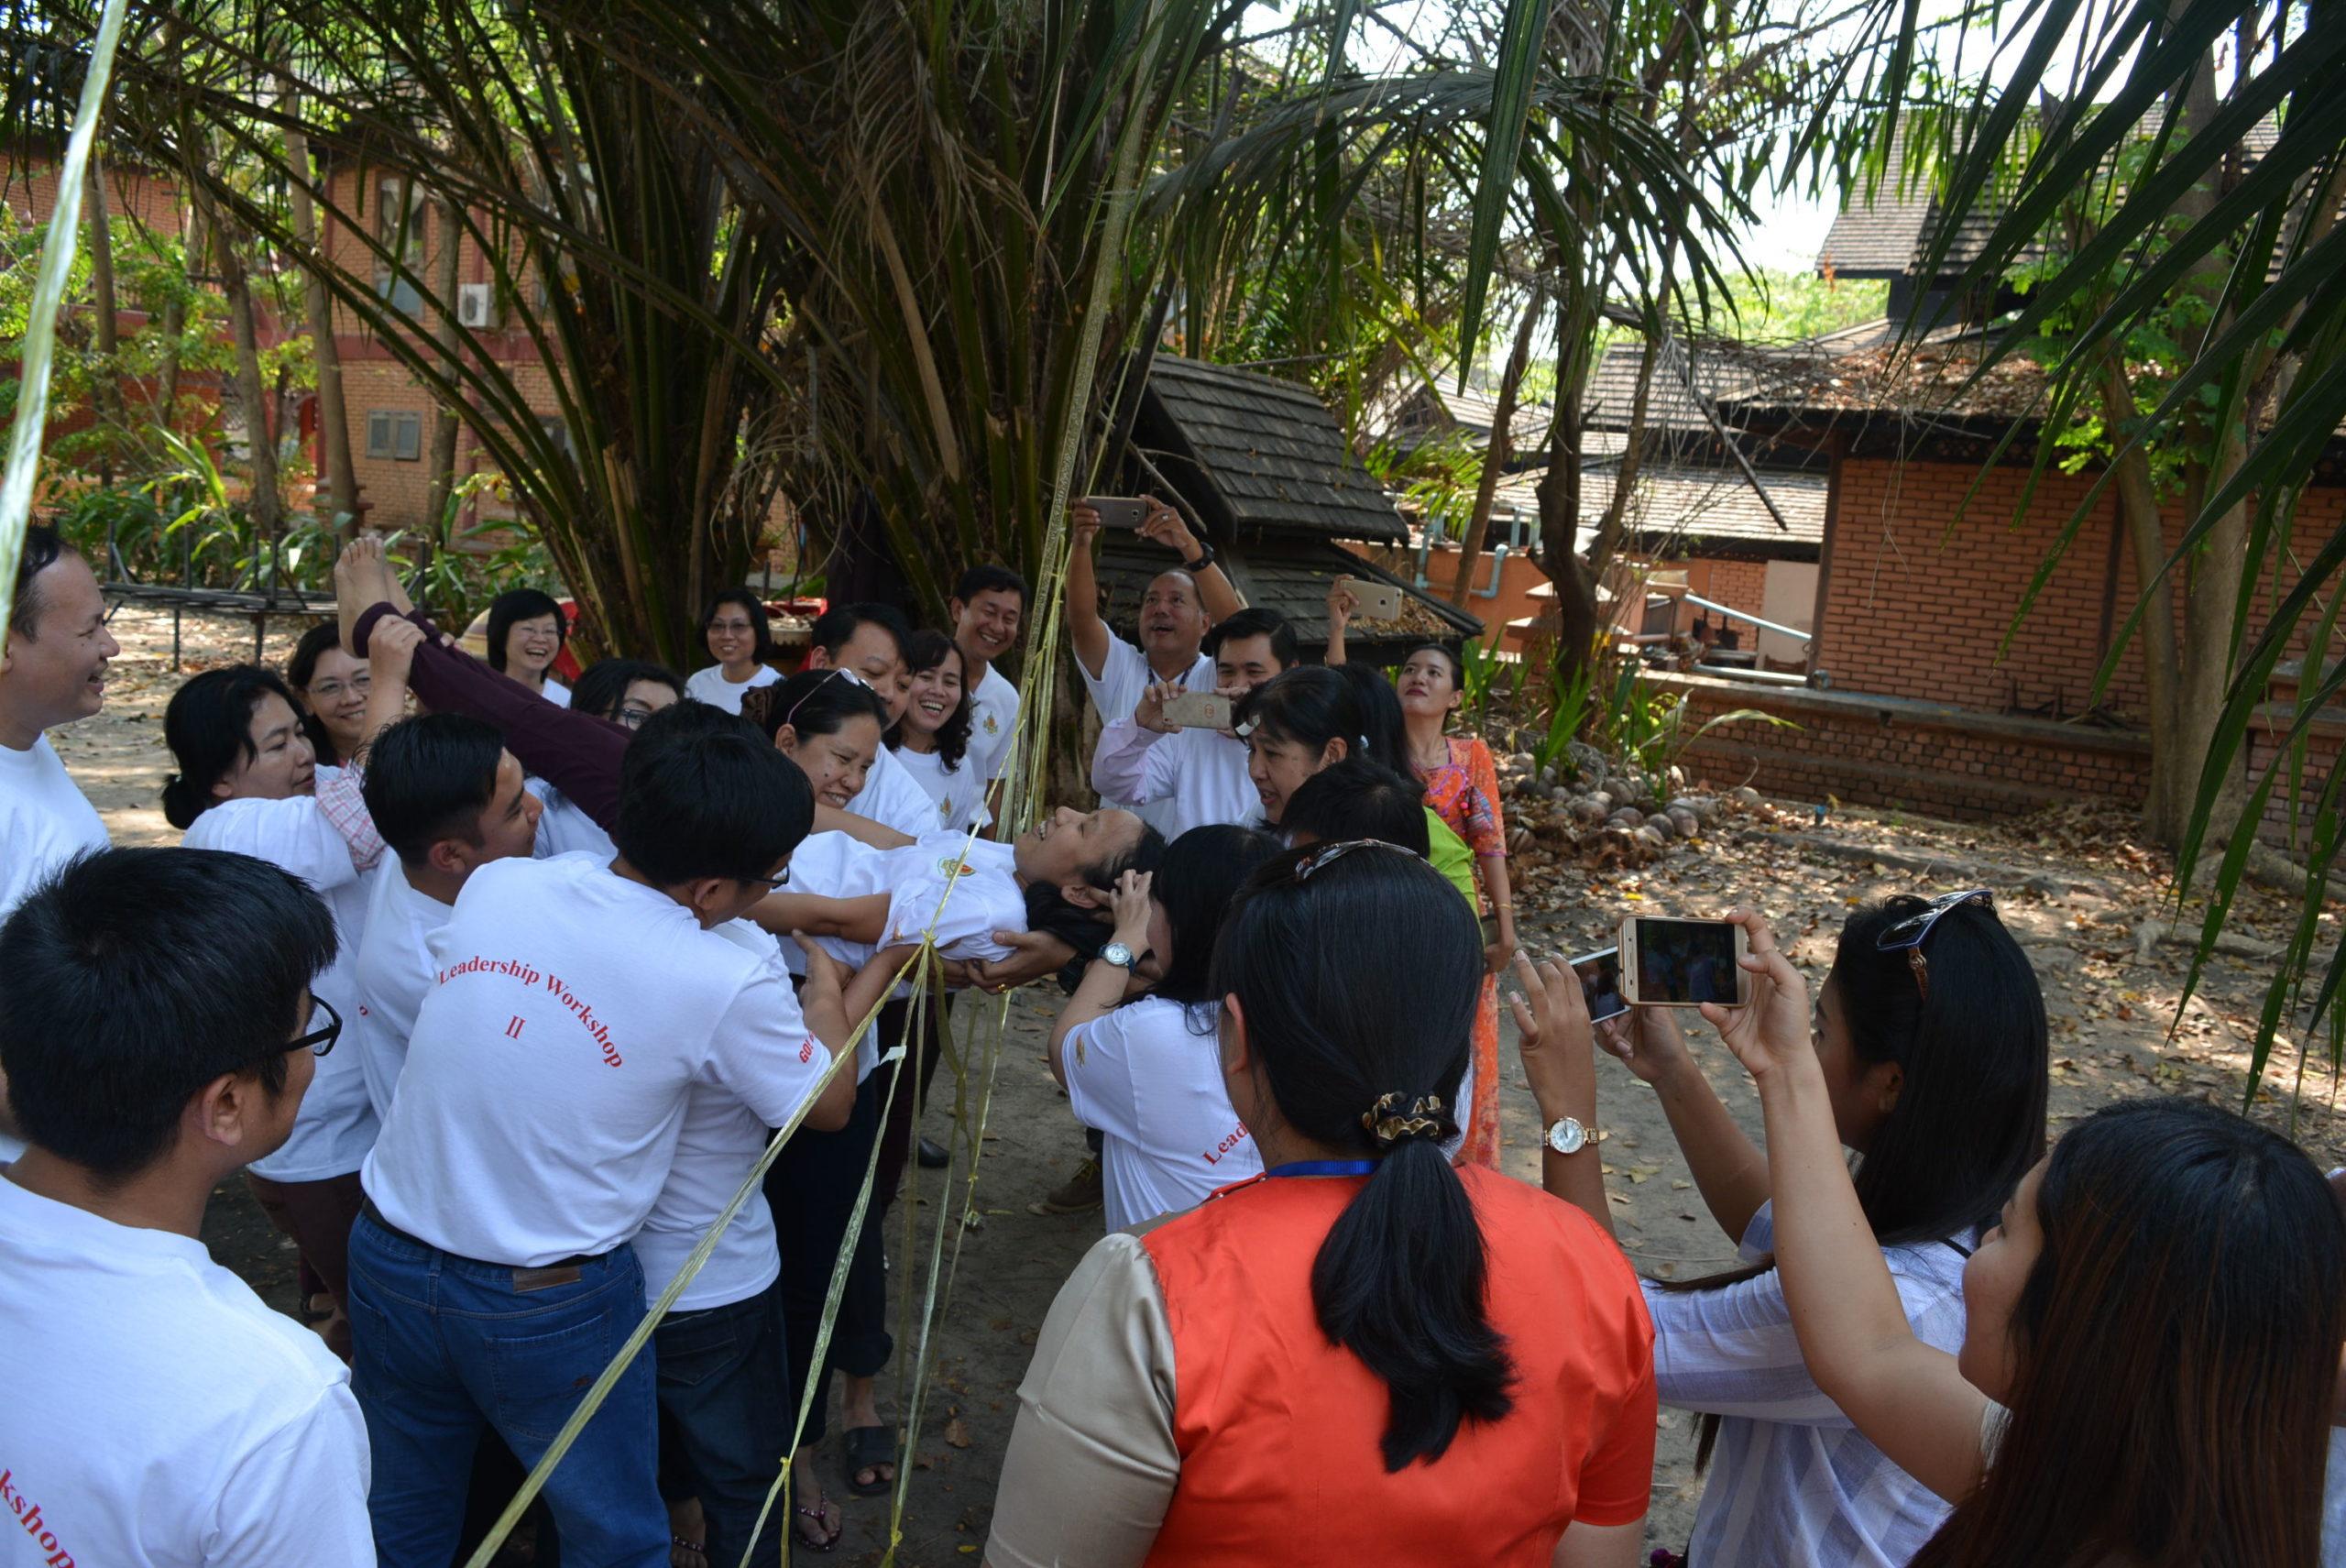 CEFE New Step in Myanmar Medical Field